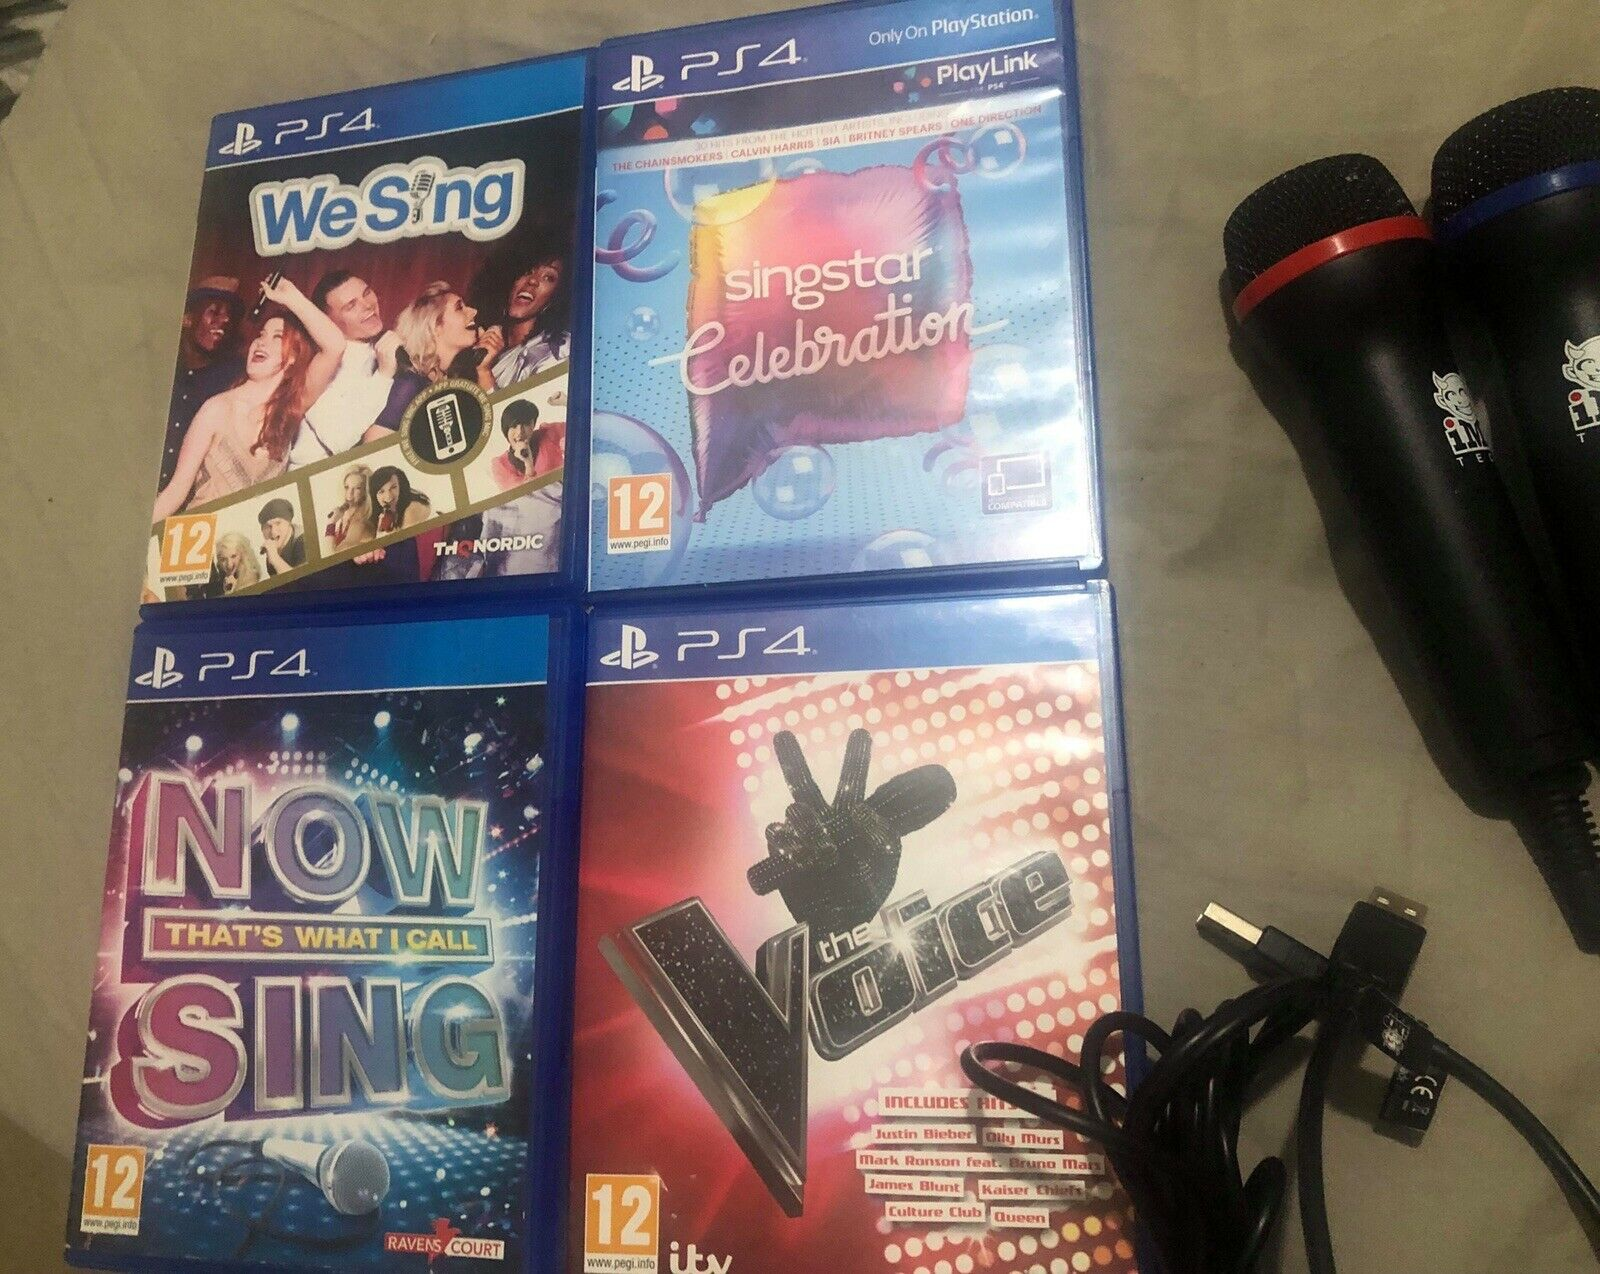 PS4 Mics Singing Family Multiplayer Bundle Now Sing We Sing Sing star The Voice